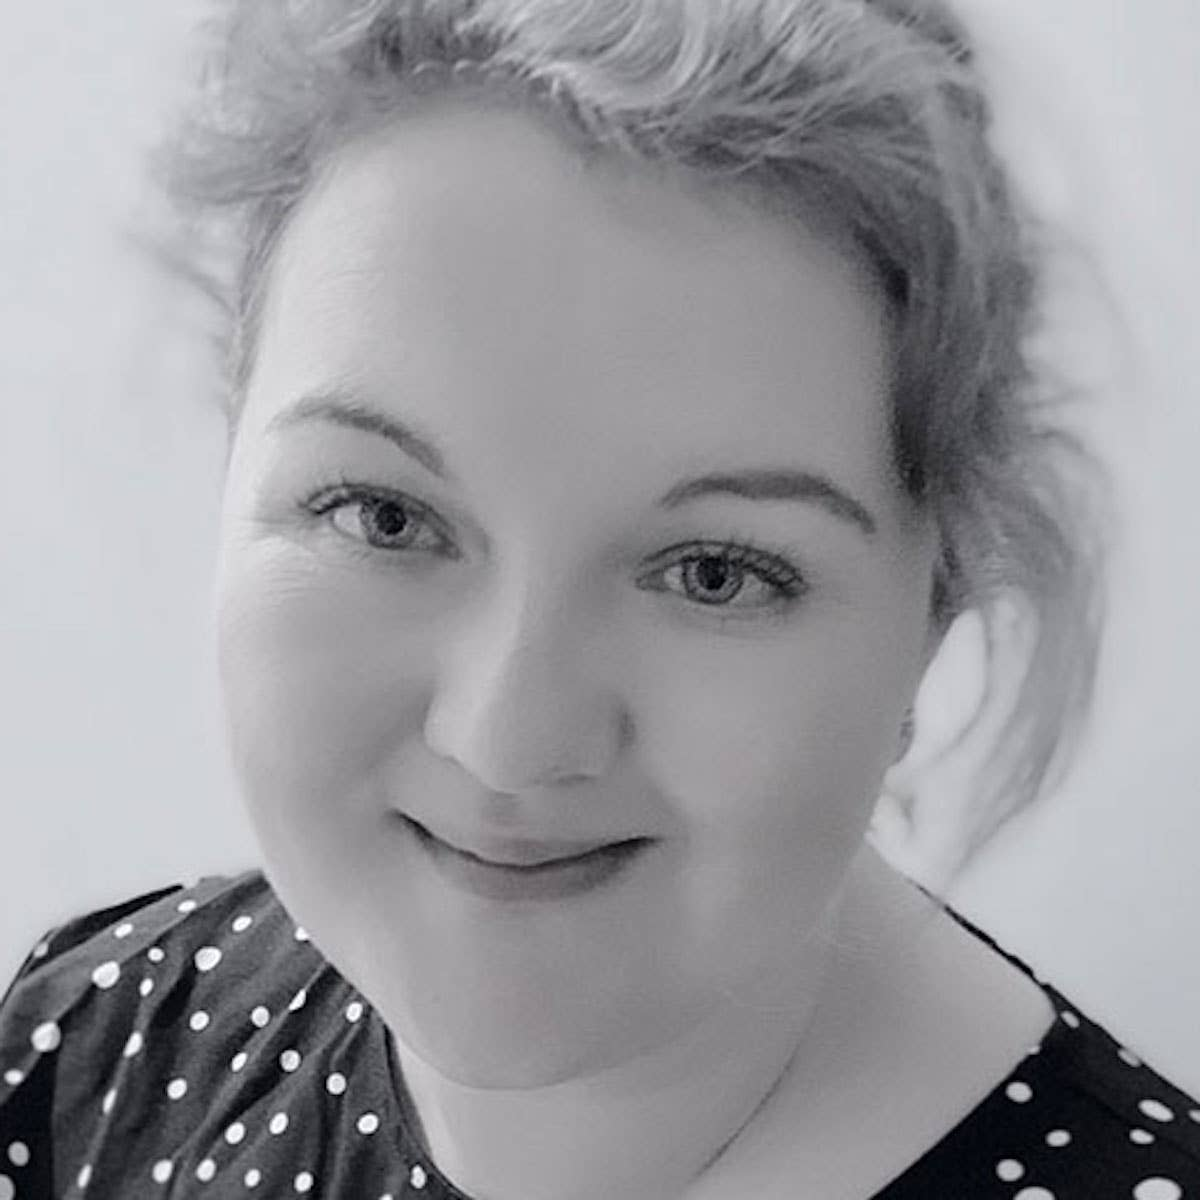 Lauren Small, managing director, Carat Sydney